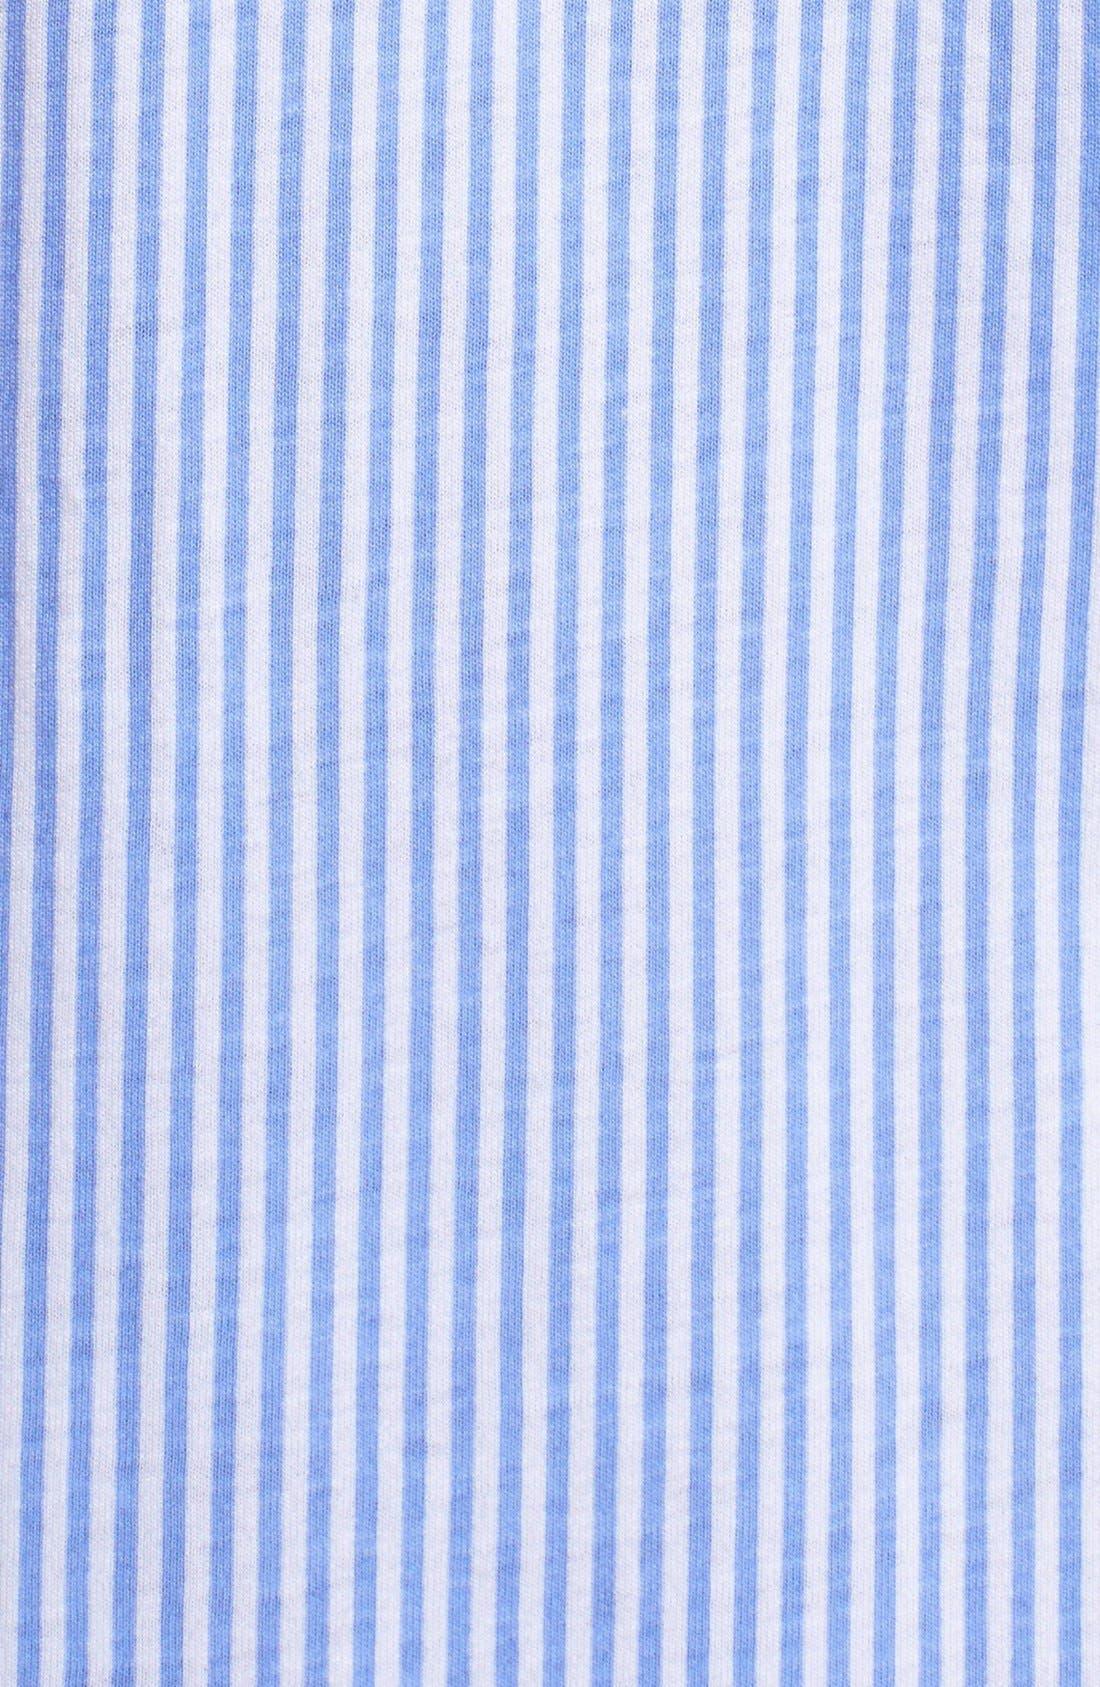 Jersey Sleep Shirt,                             Alternate thumbnail 14, color,